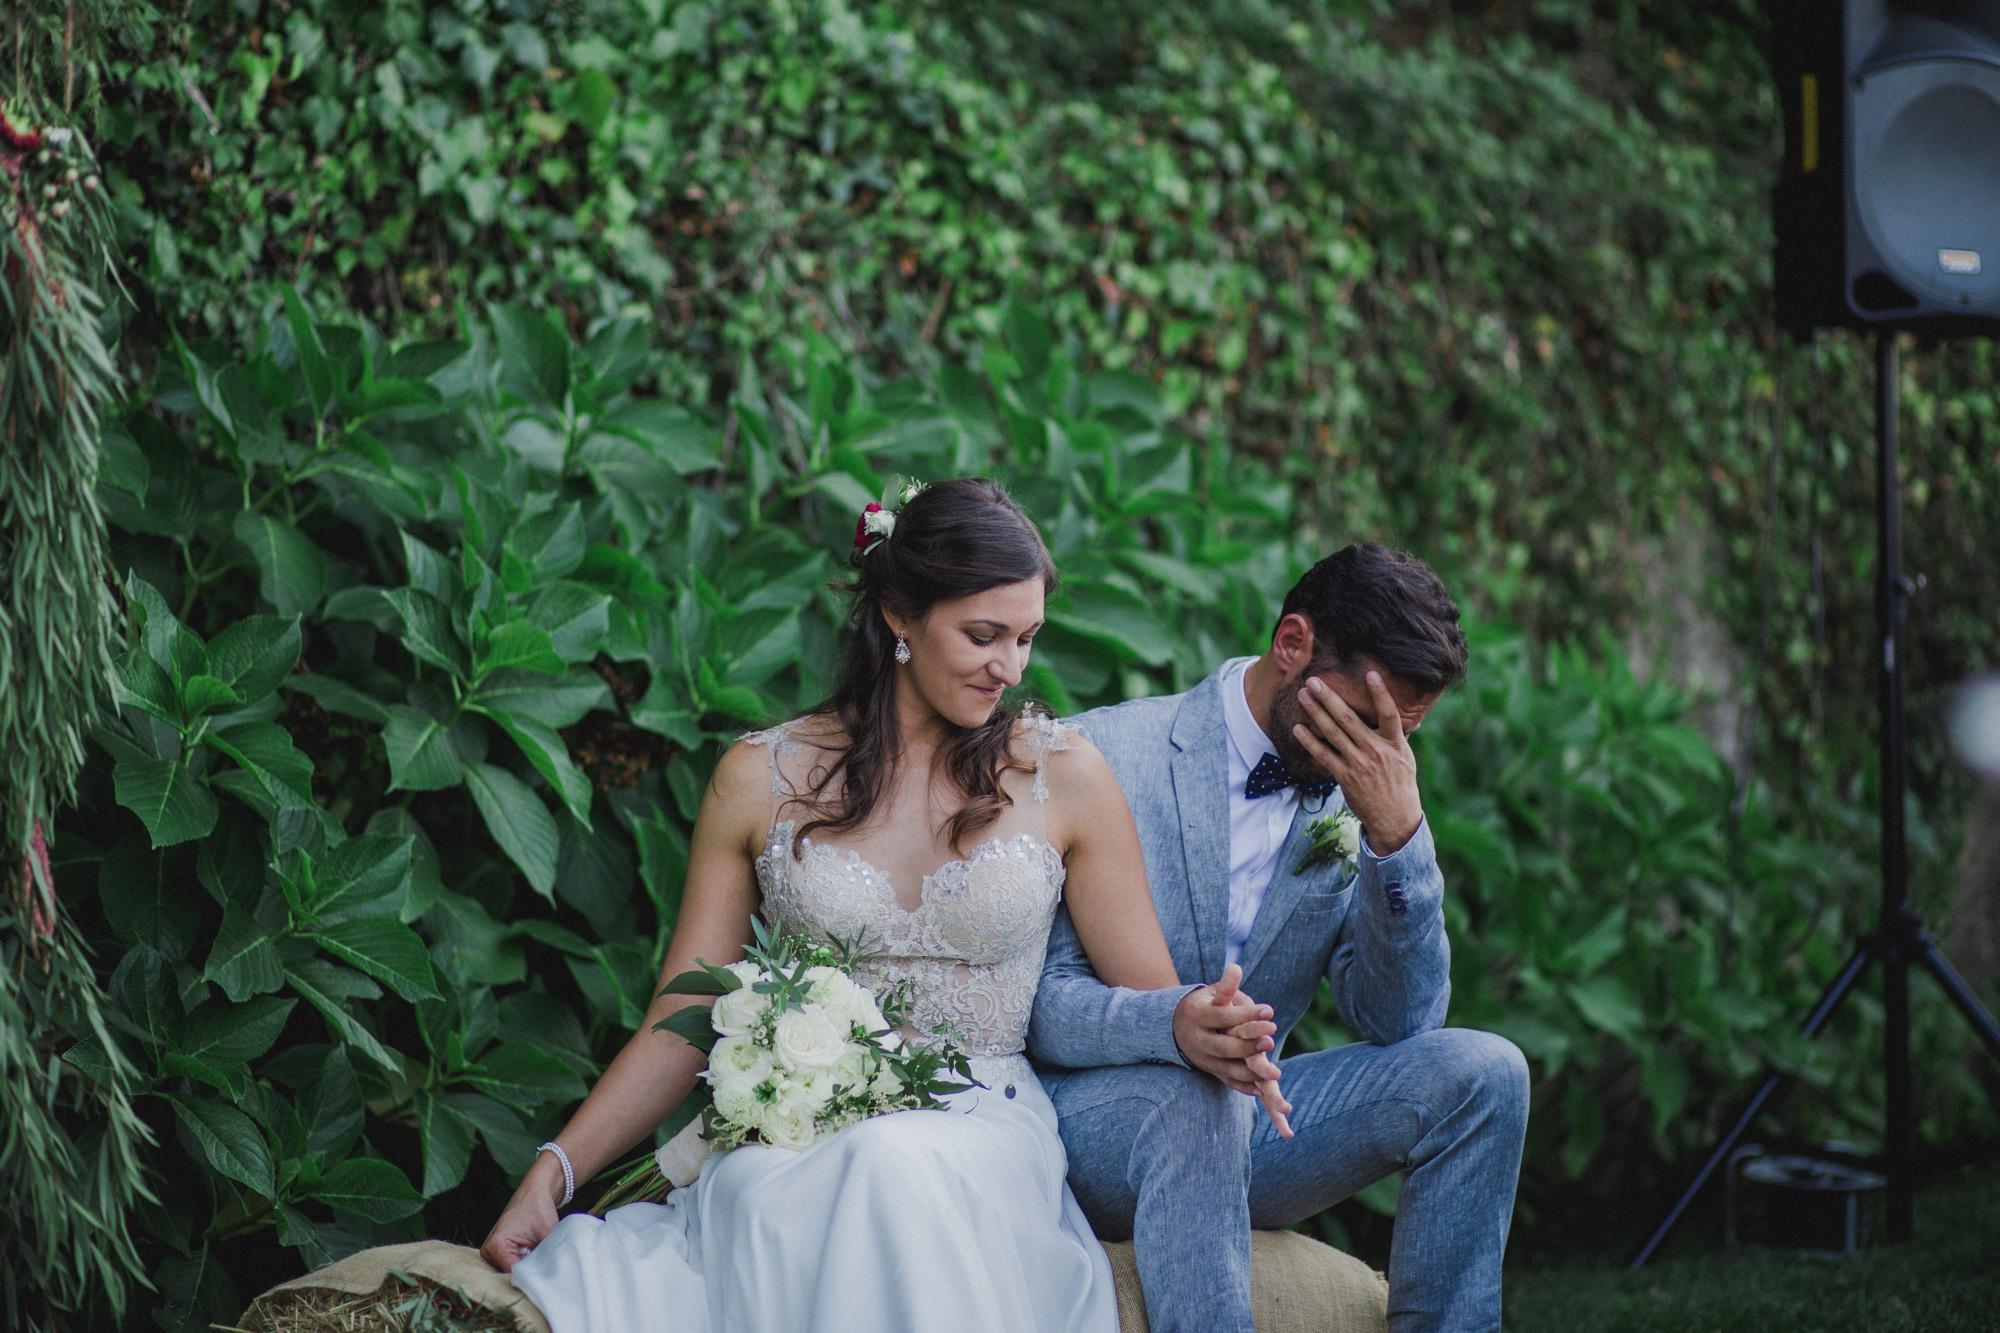 055-carina-e-samuel-wedding-casamento-quinta-dos-rouxinois-rustico-my-fancy-wedding-mafra-malveira-lisboa-sintra-cascais-filipe-santiago-fotografia-fotografo-lifestyle-destination-portugal